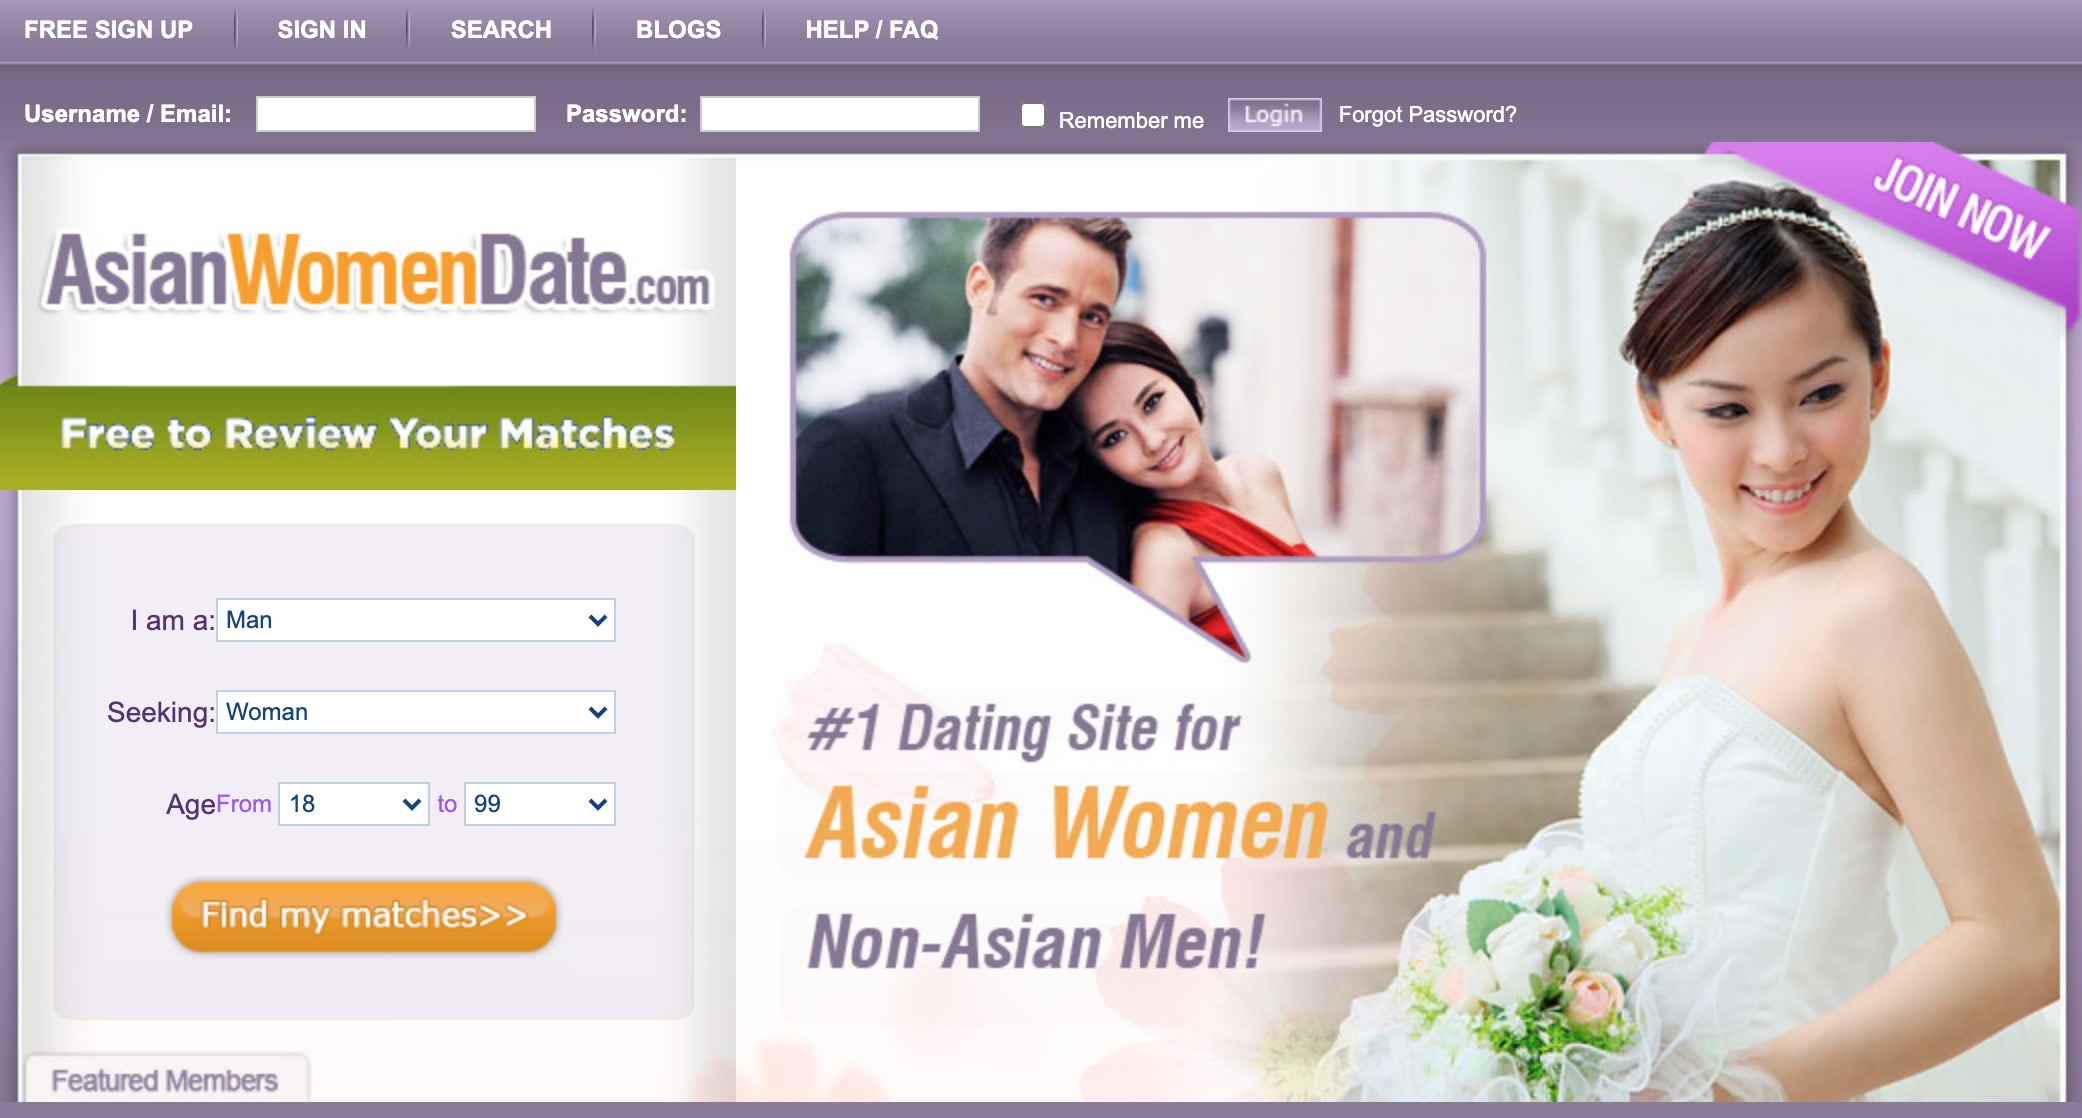 AsianWomenDate main page